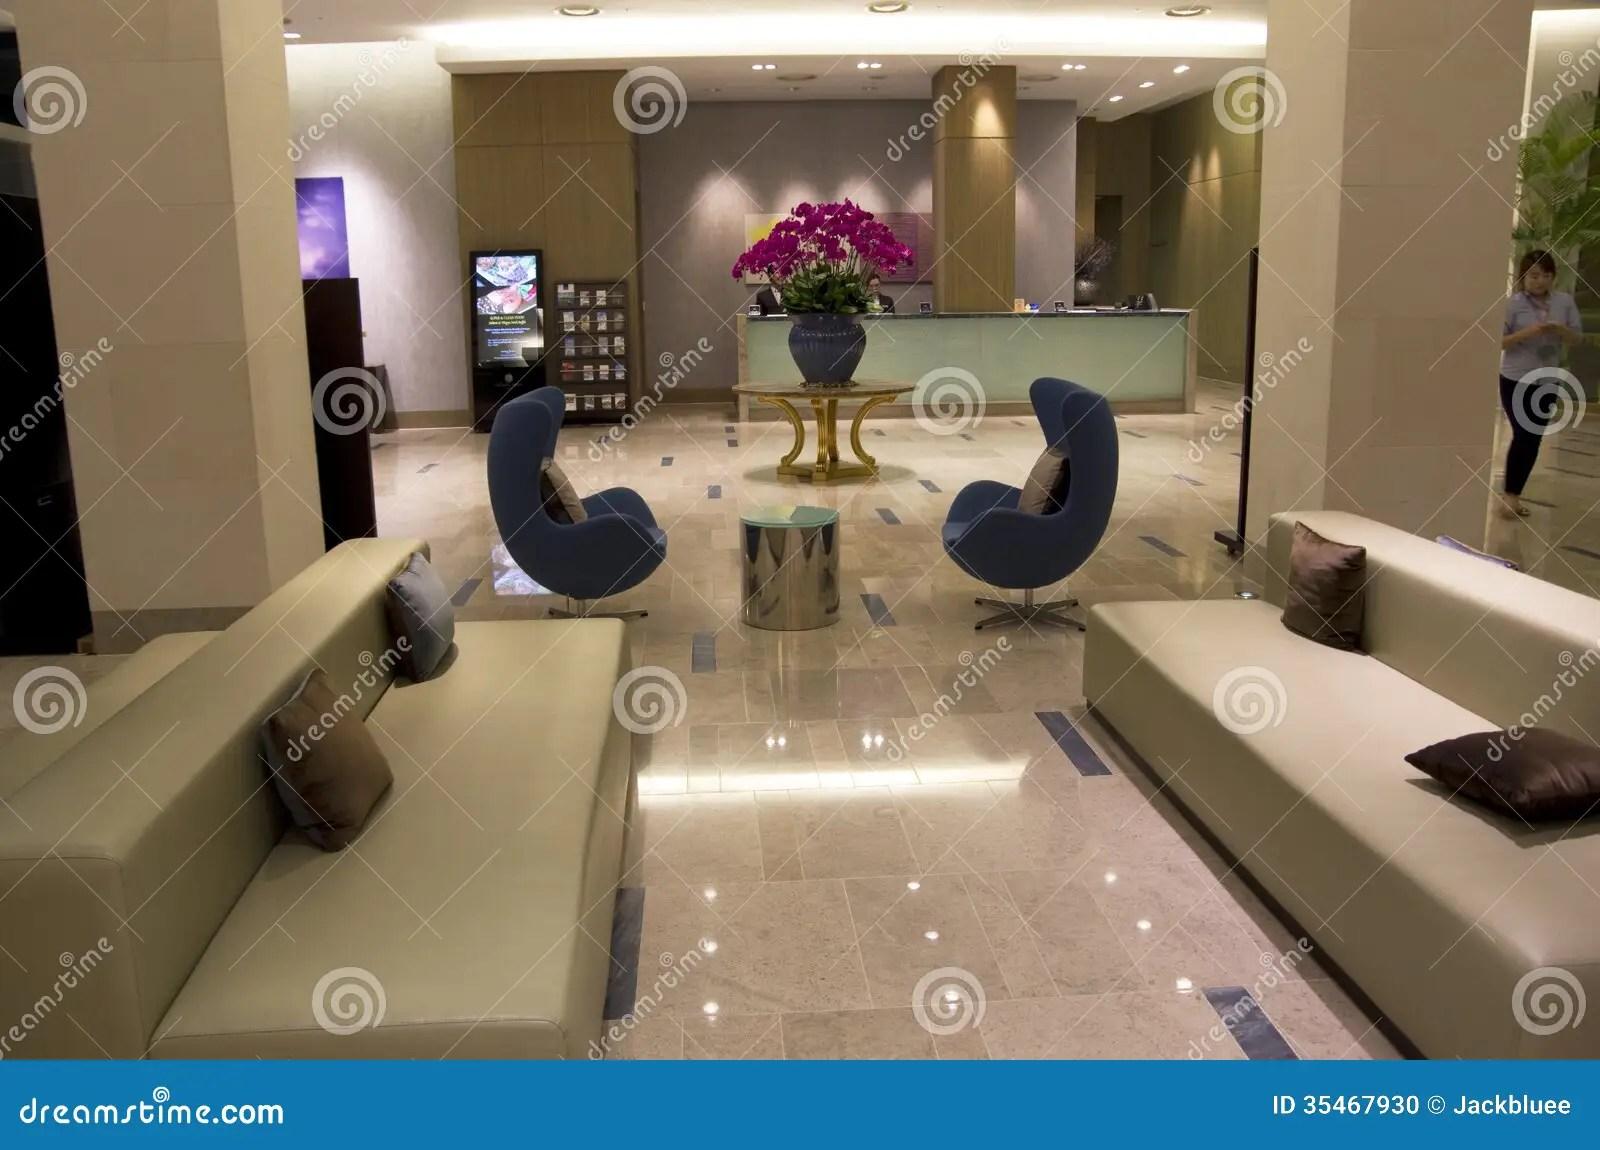 chair design for hotel massage sofa luxury modern lobby furniture editorial image